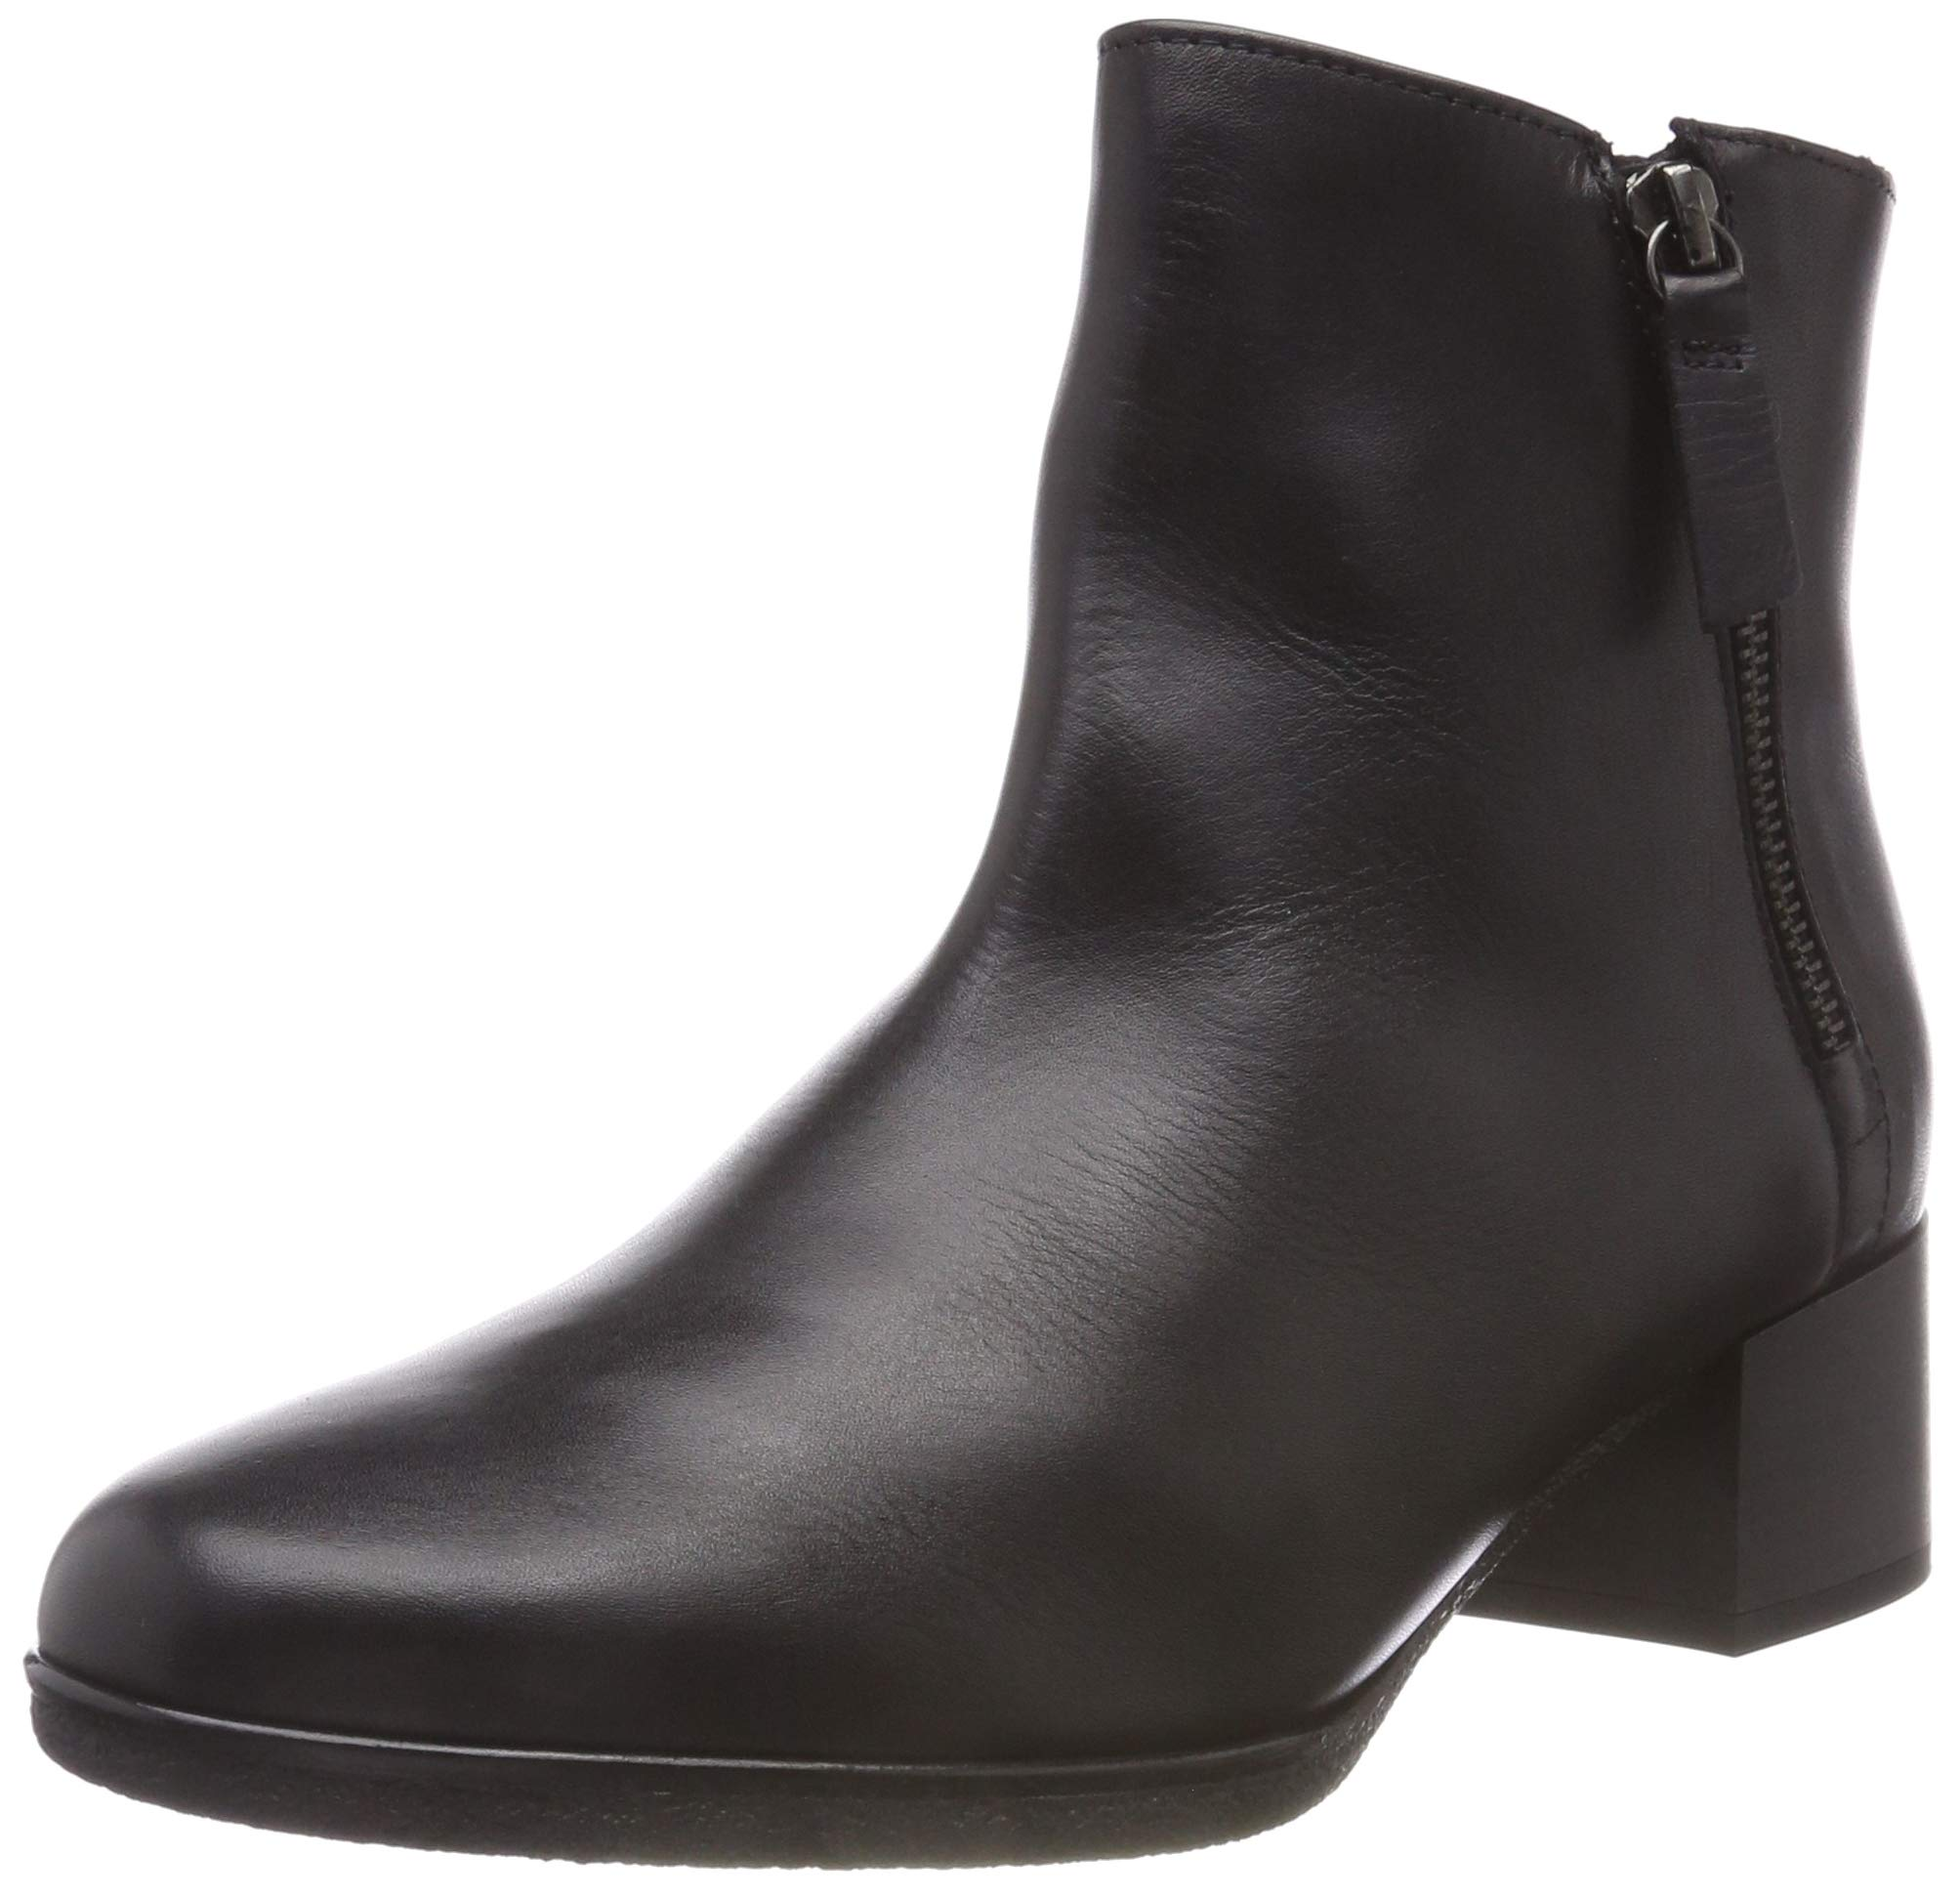 Eu FemmeNoirschwarzmicro5737 5 Gabor Shoes Comfort SportBotines 6Yfybv7g